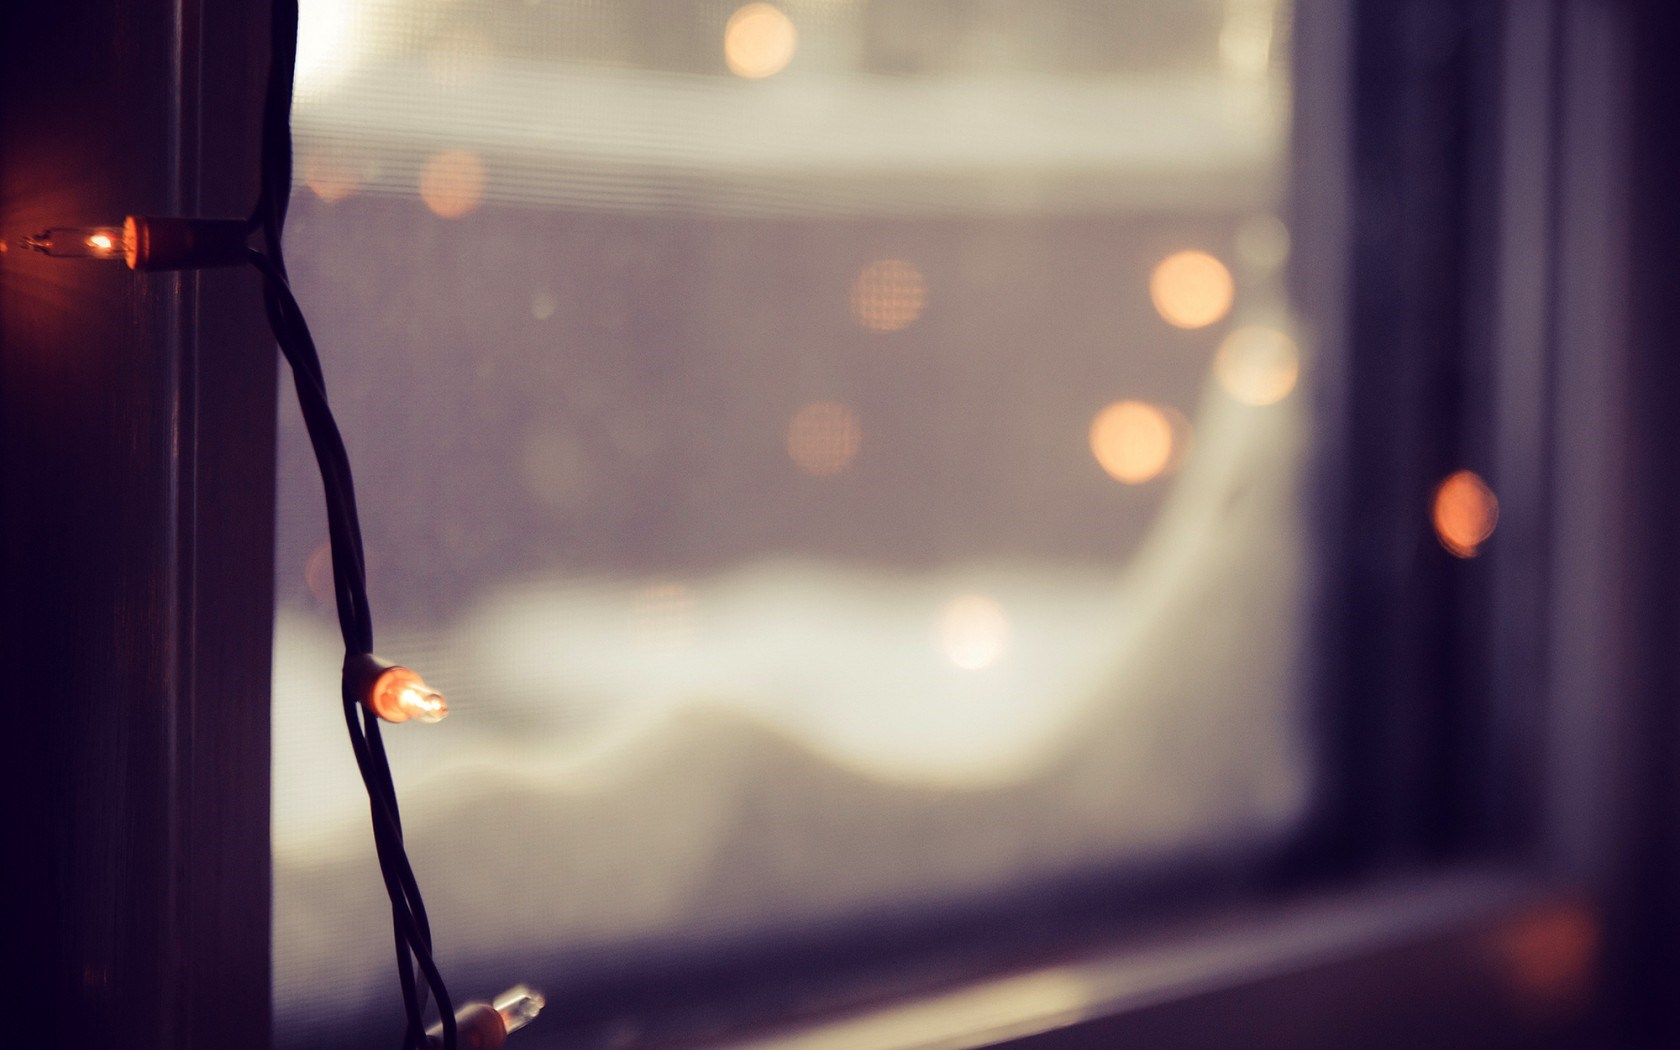 Window christmas garland lights winter wallpaper for Window lights